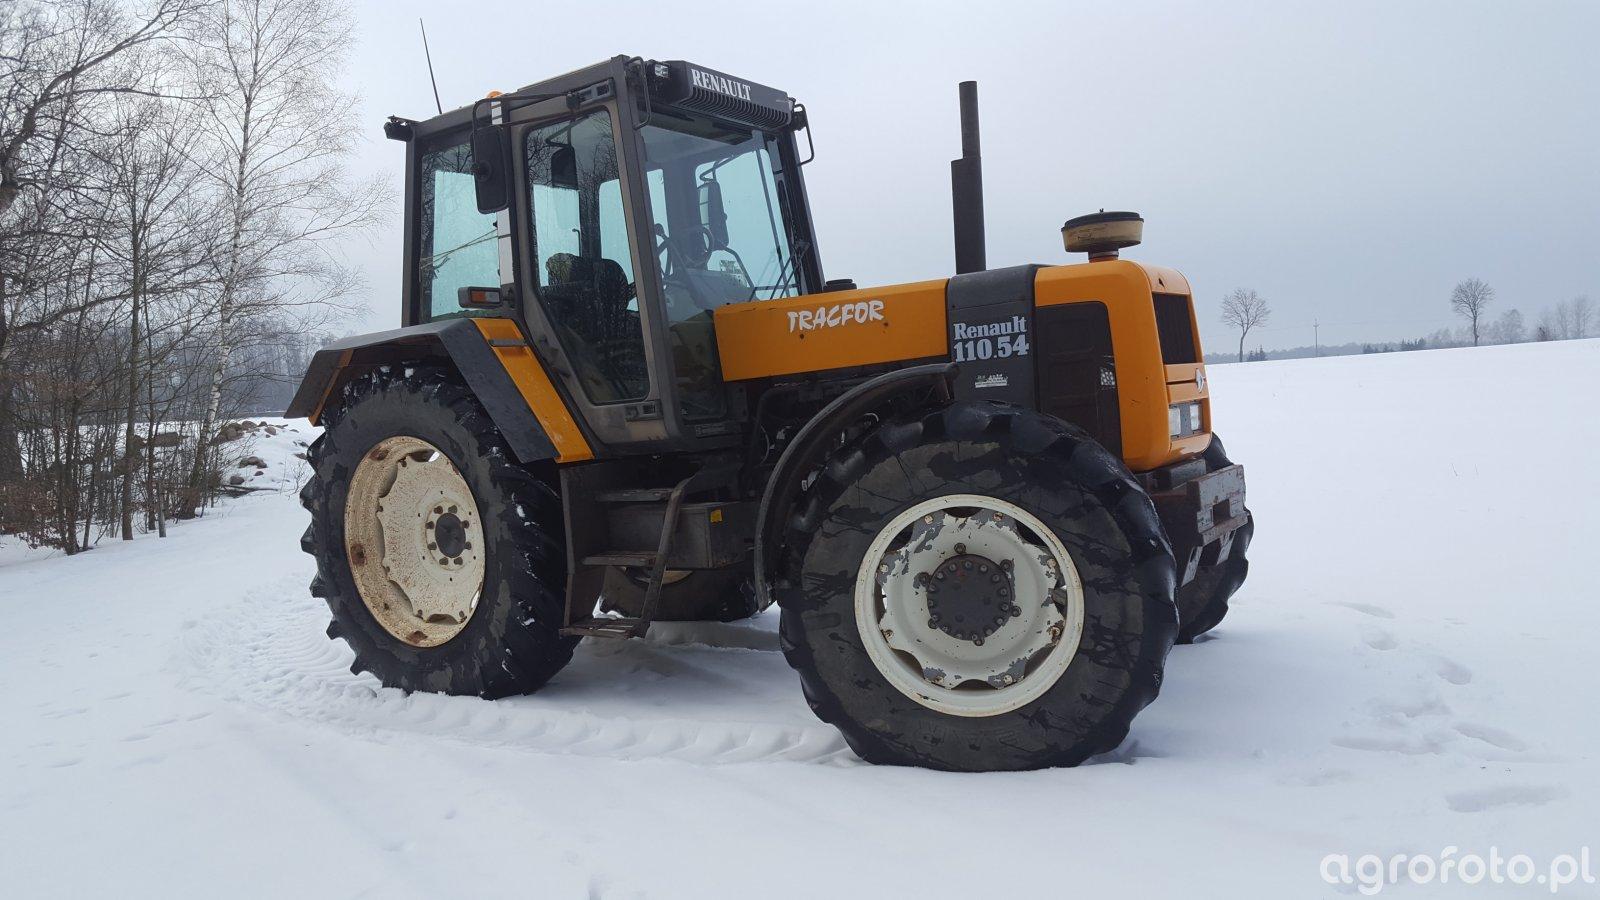 Renault 110.54